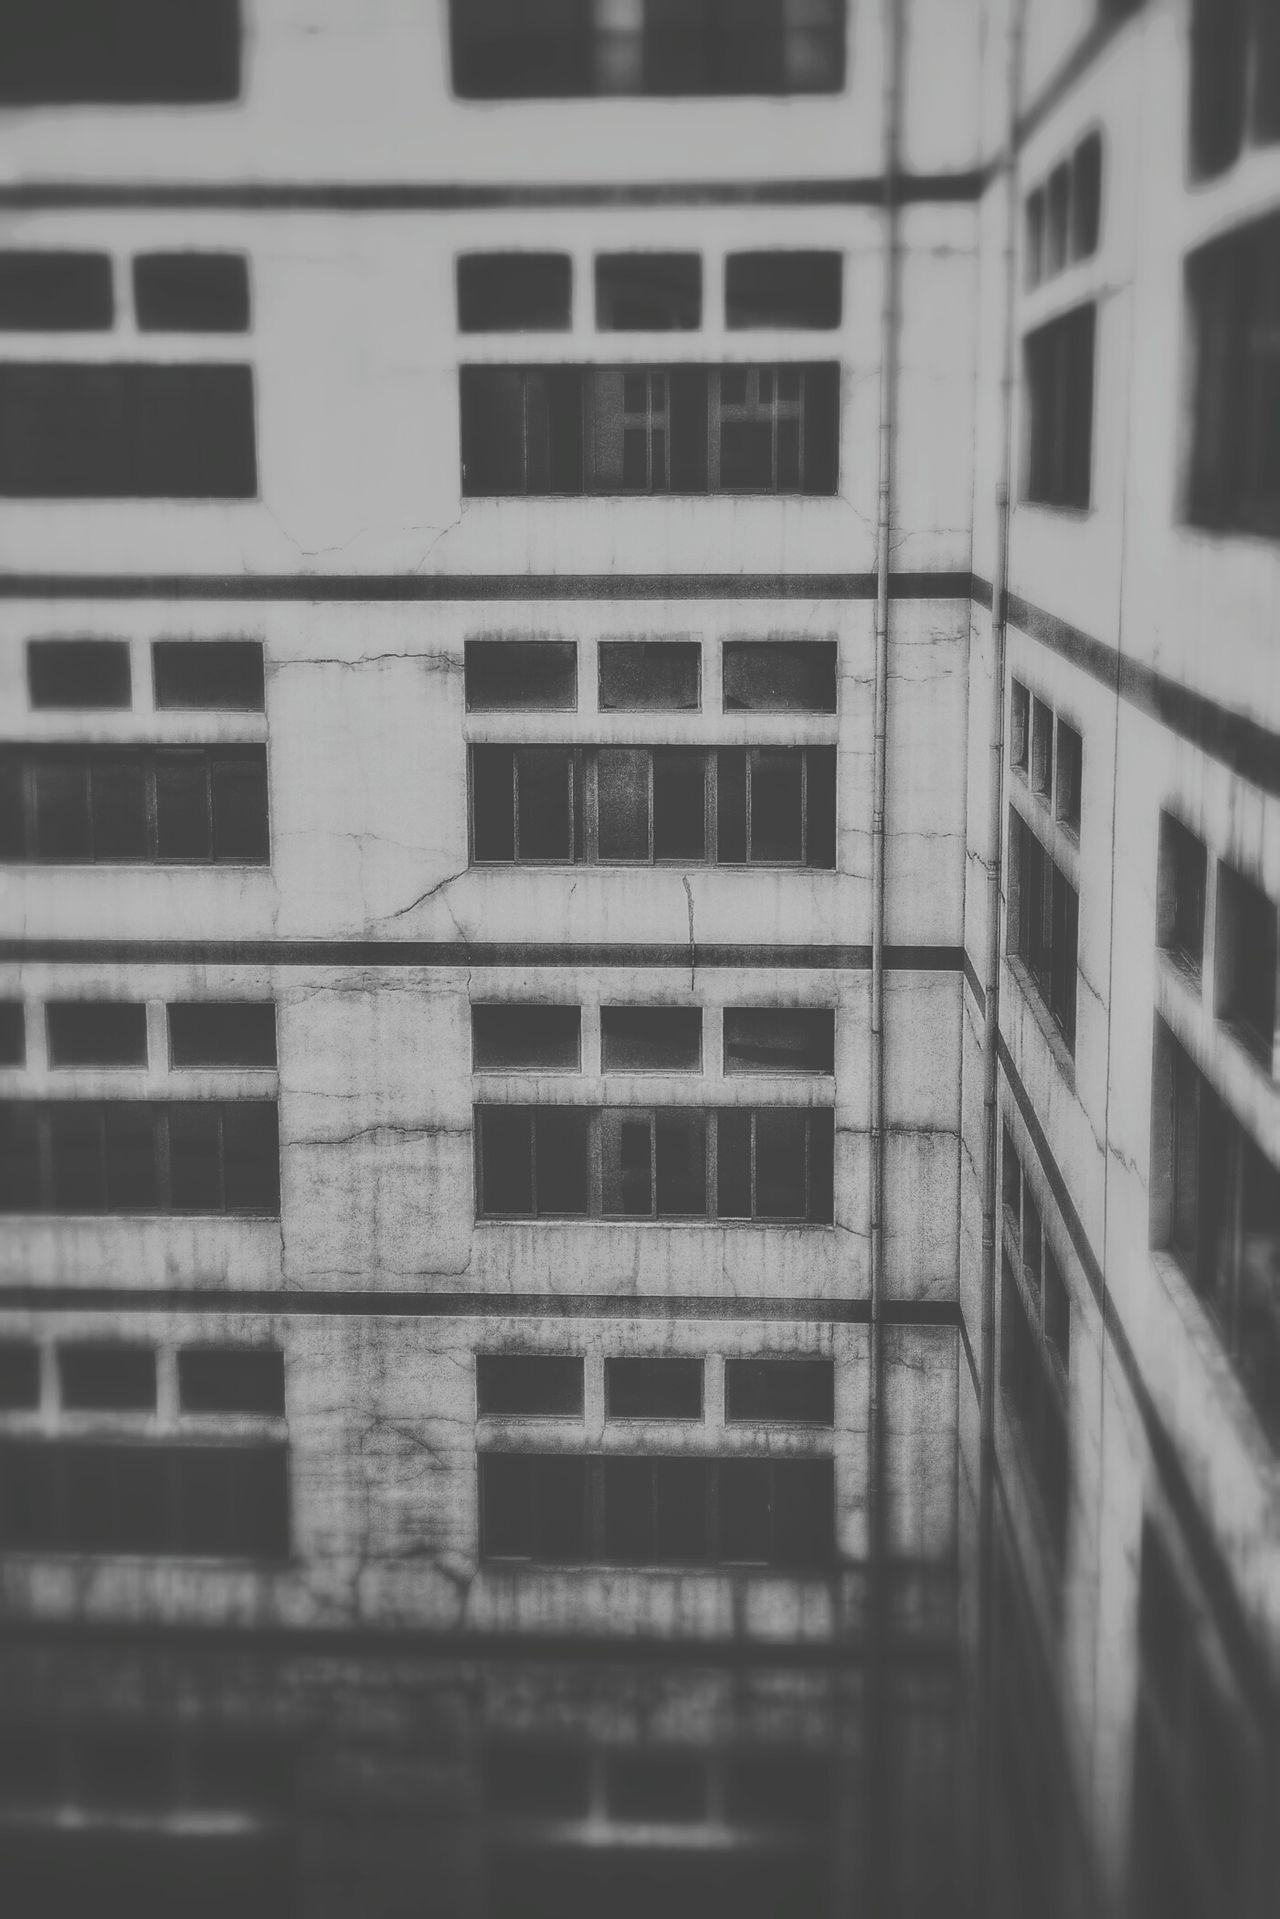 EyeEm Best Shots - Black + White Old Buildings Still Life Terrible Day Sunday Walk EyeEm Gallery The Weekend On EyeEm Window View Whatever It Takes